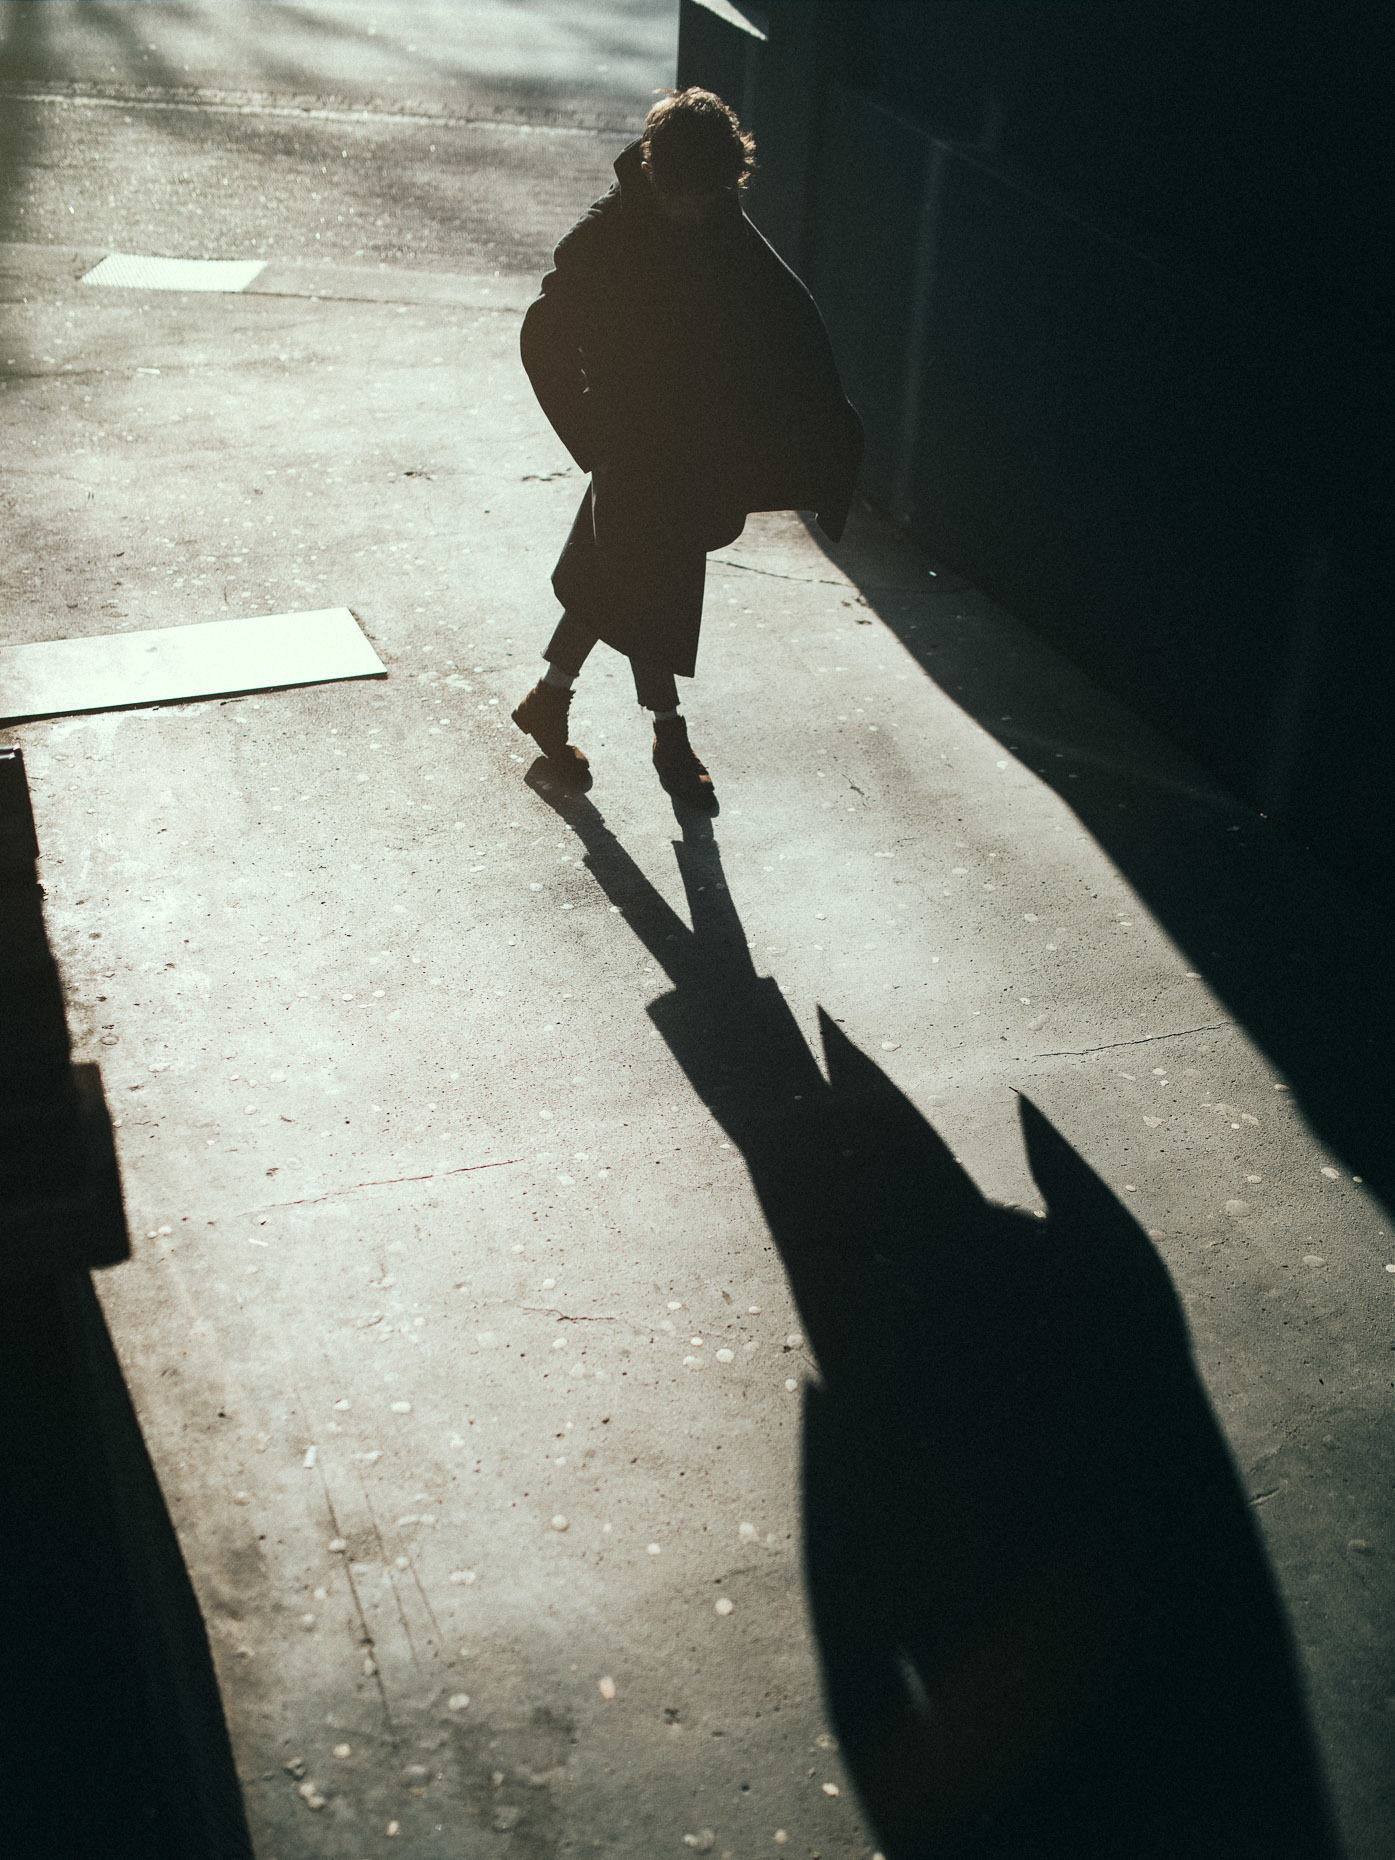 HAUSER FOTOGRAFEN: MARTIN BÜHLER +++ PERSONAL WORK +++ Christian